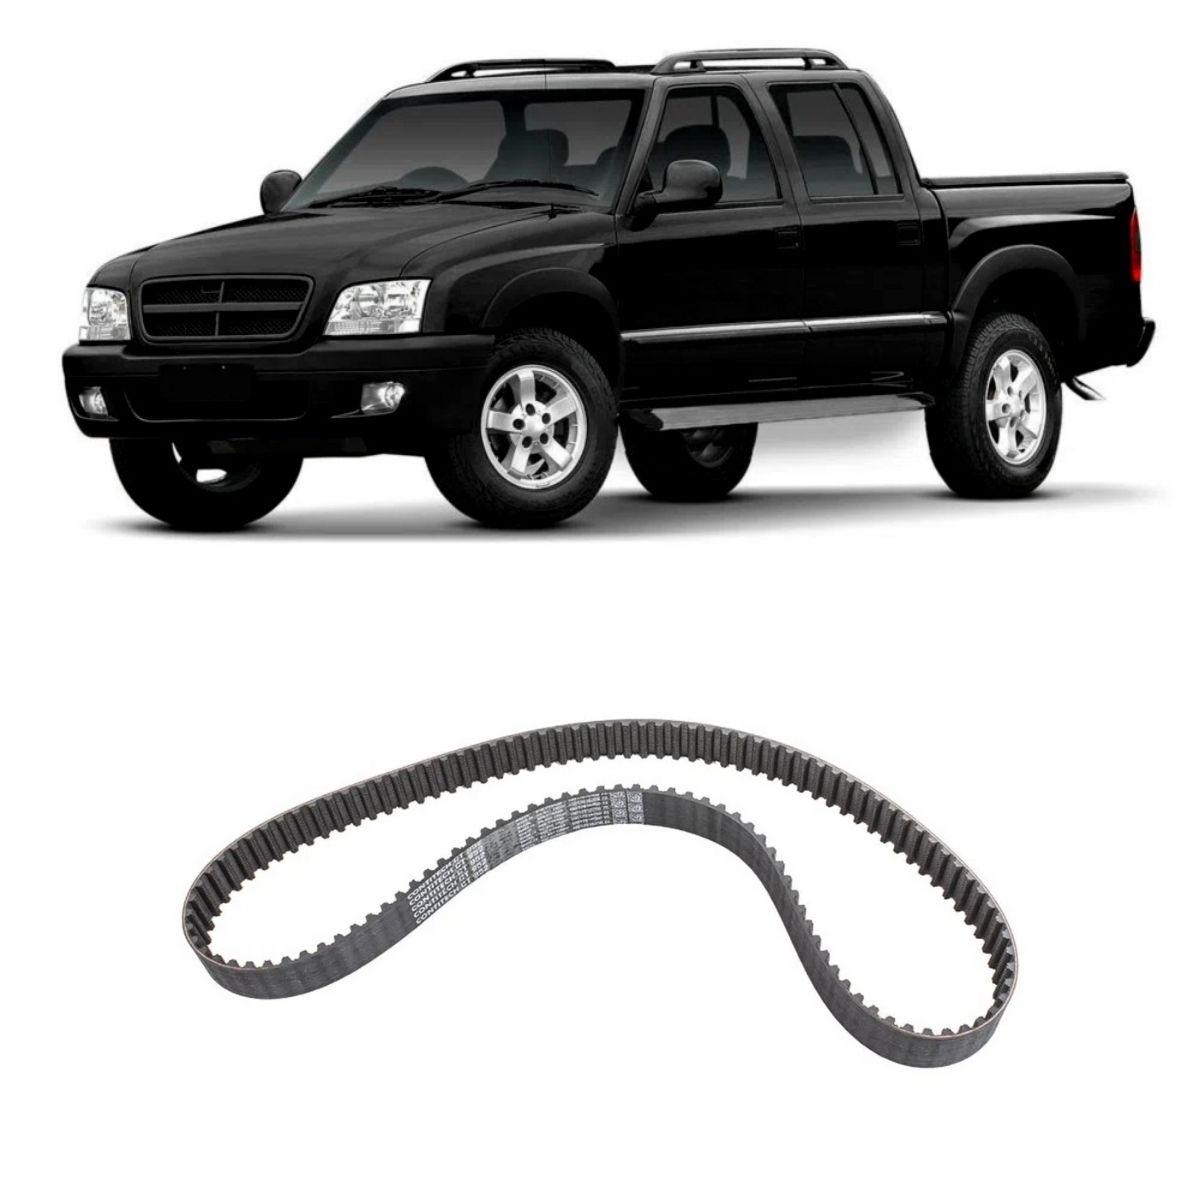 Correia Dentada S10 2.5 1995/2002 Ranger 1998/2002 Diesel